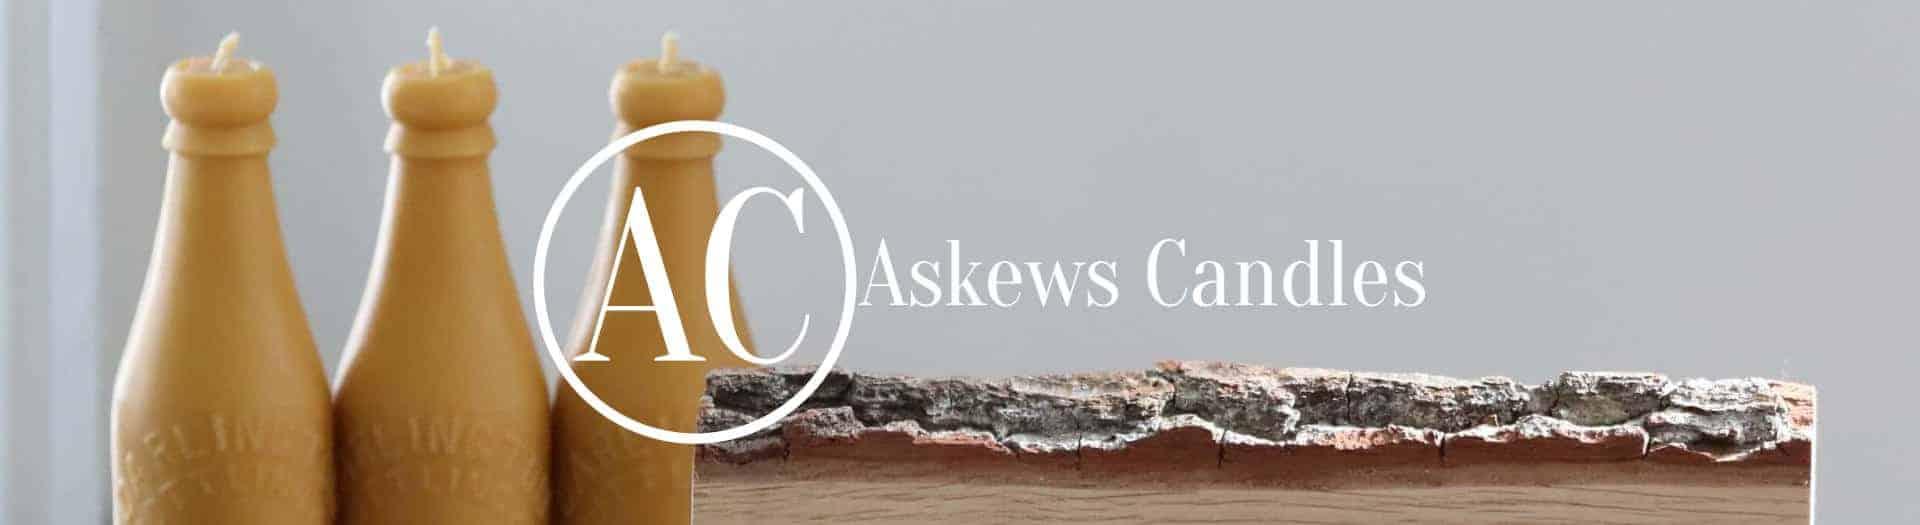 1920x525 Askews Candles Logo header